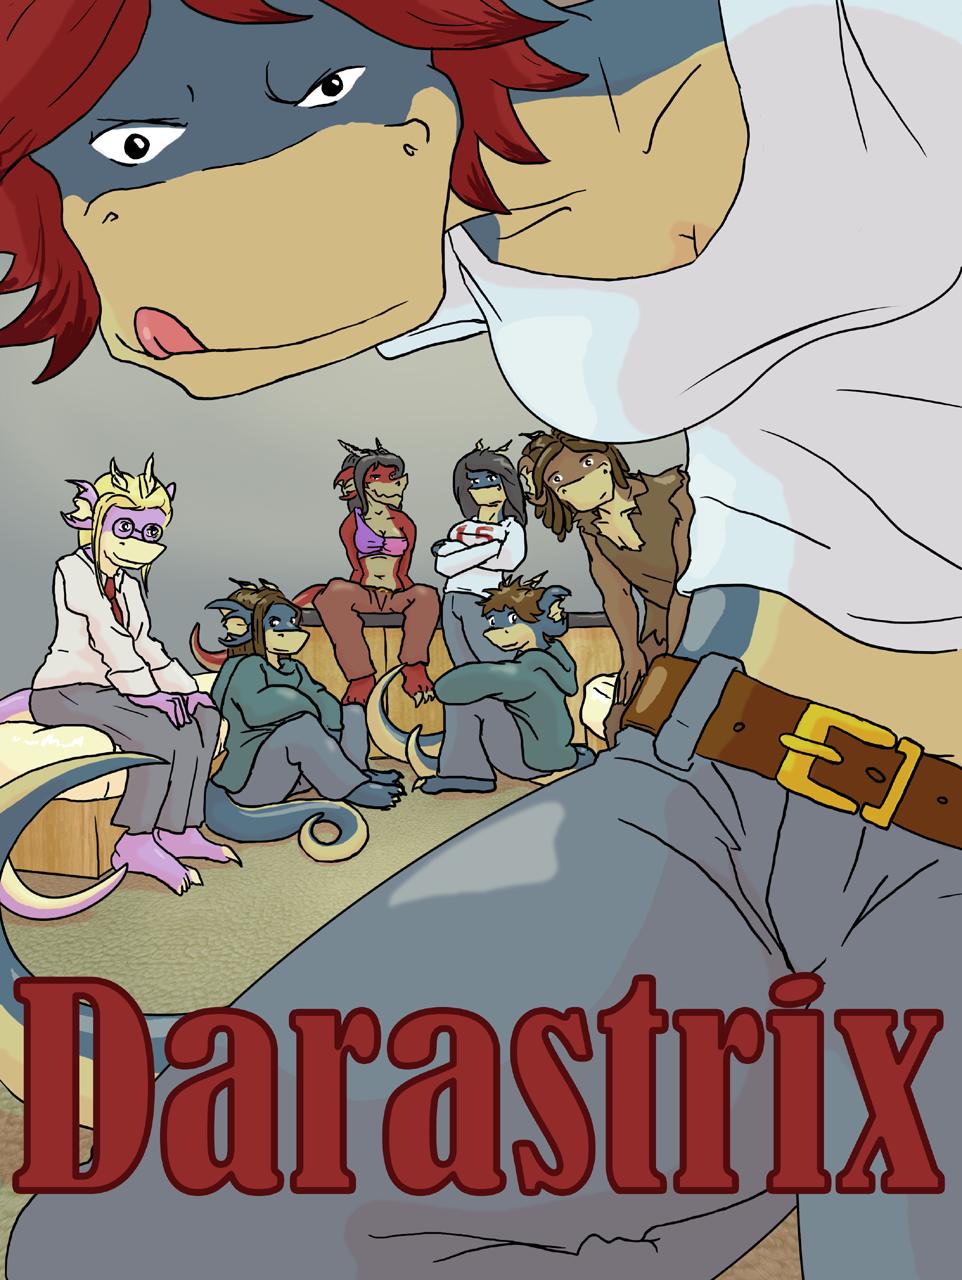 Darastrix, Page 1 by Morgoth883